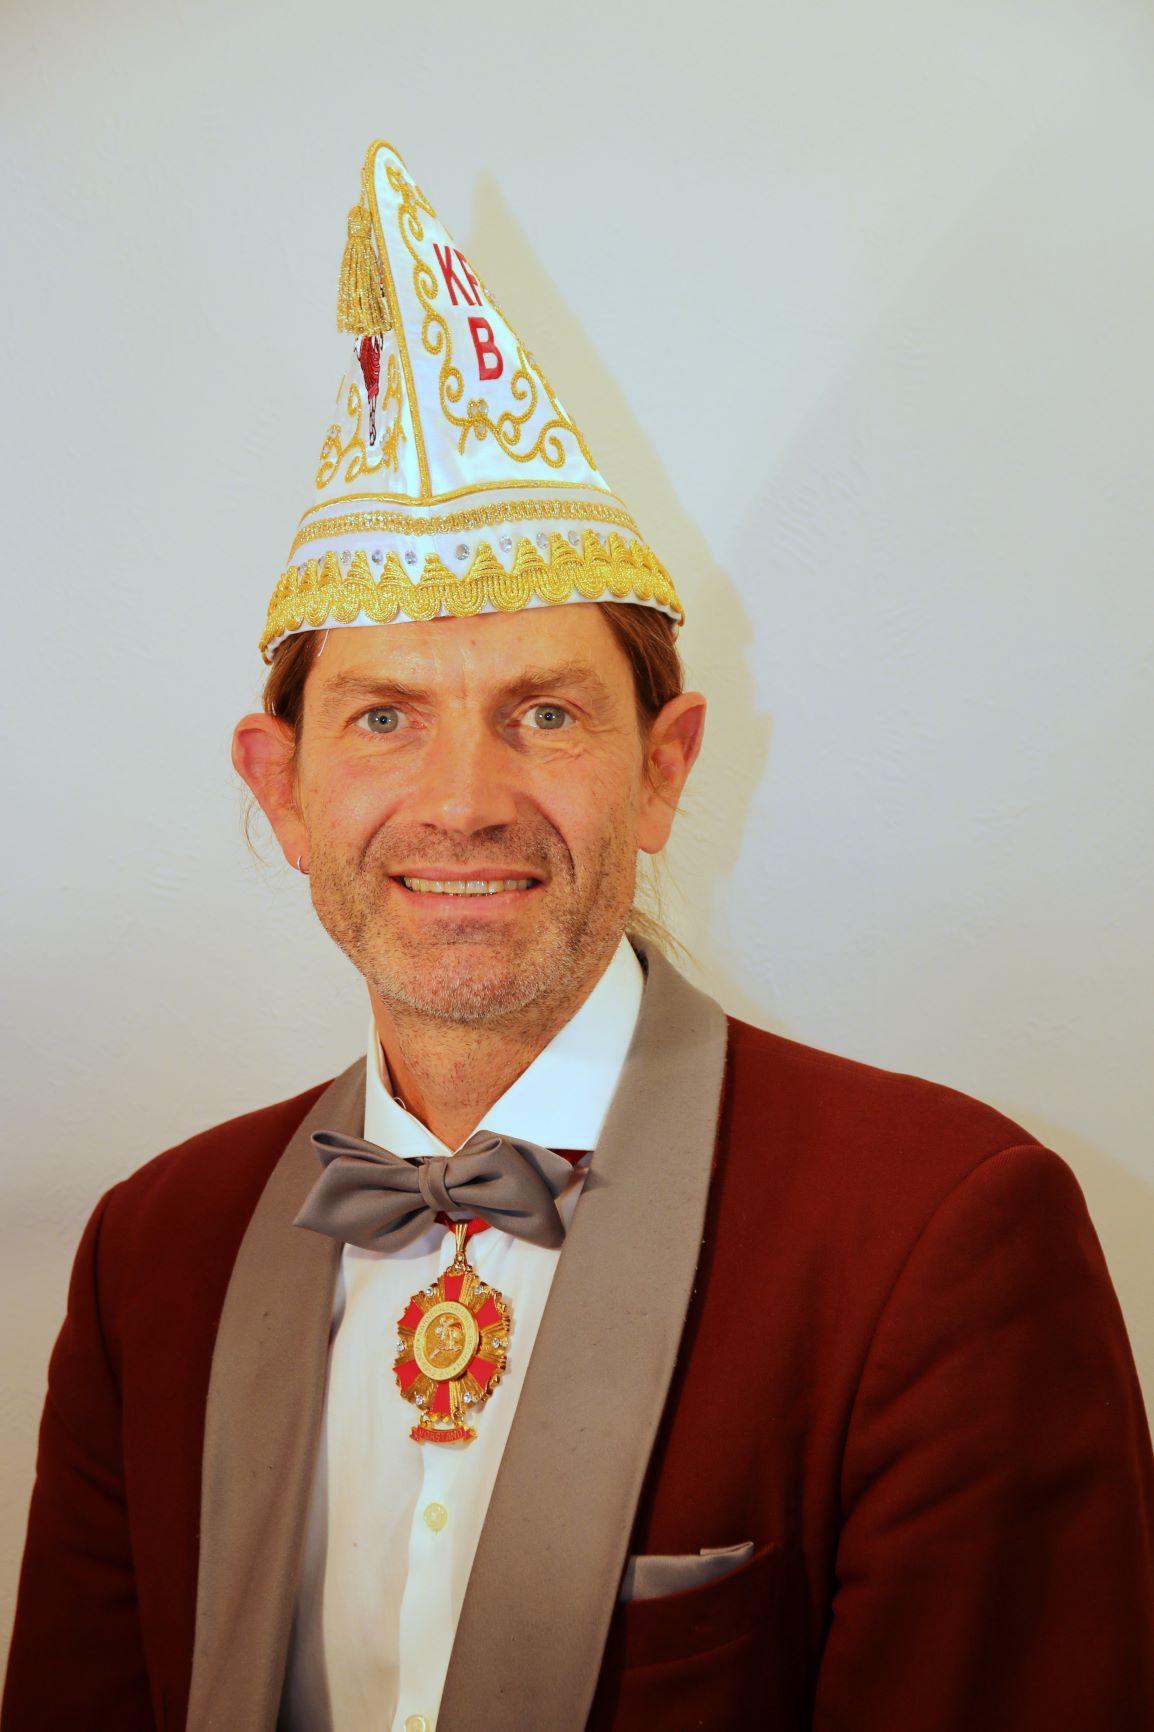 Björn Trenkwalder